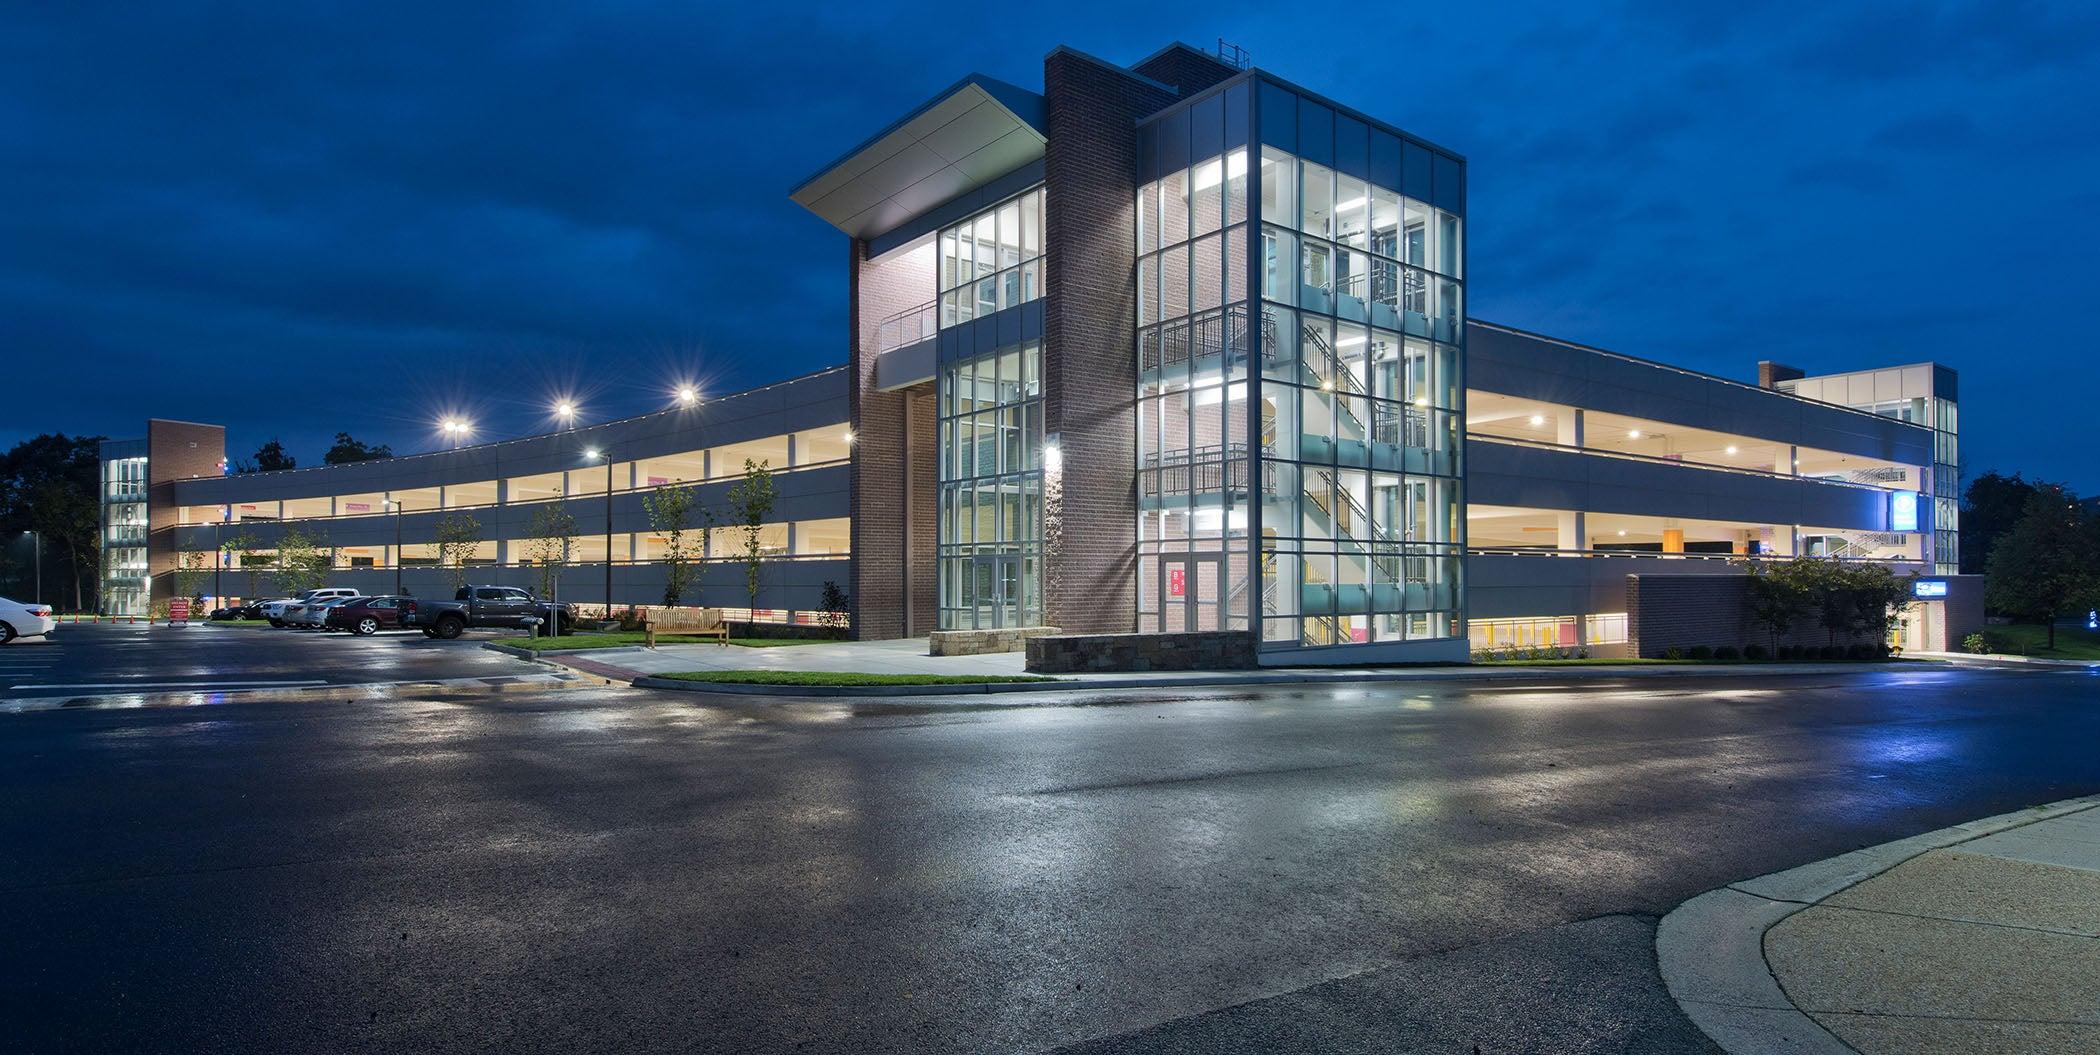 HDR-designed Inova Loudoun Hospital Parking Garage Wins